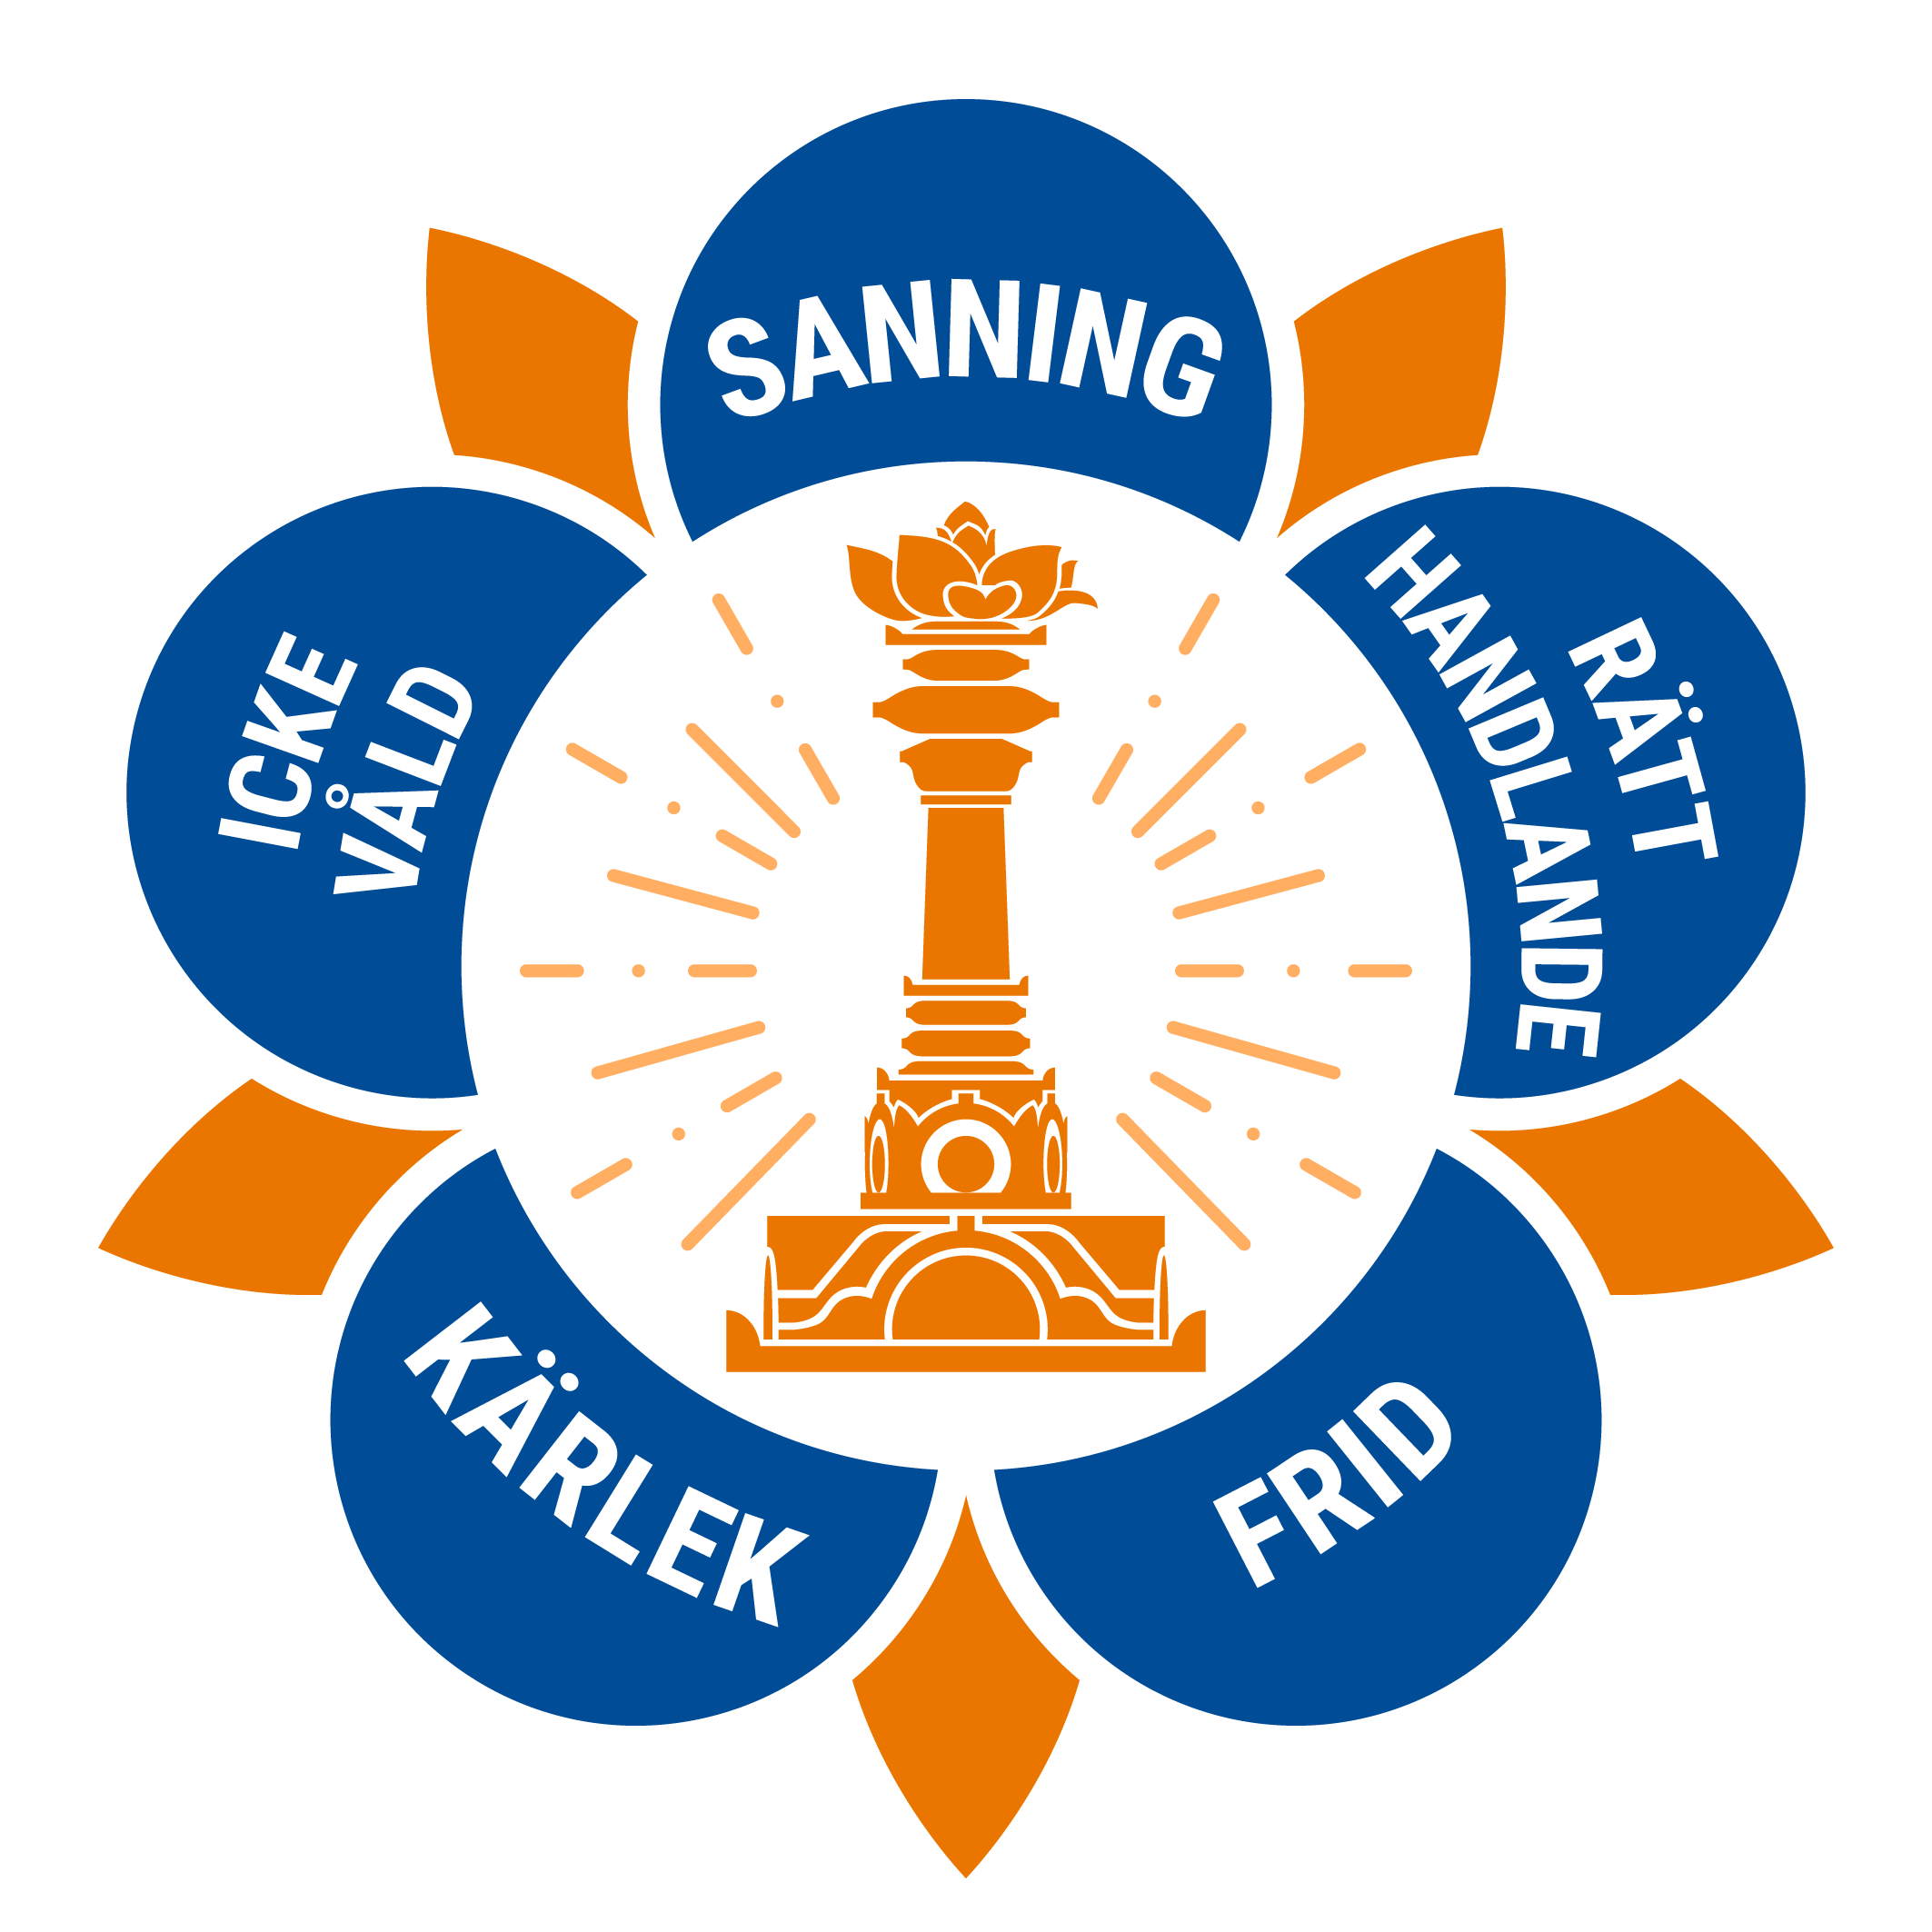 Logo Of The Sathya Sai International Organisation Sathya Sai